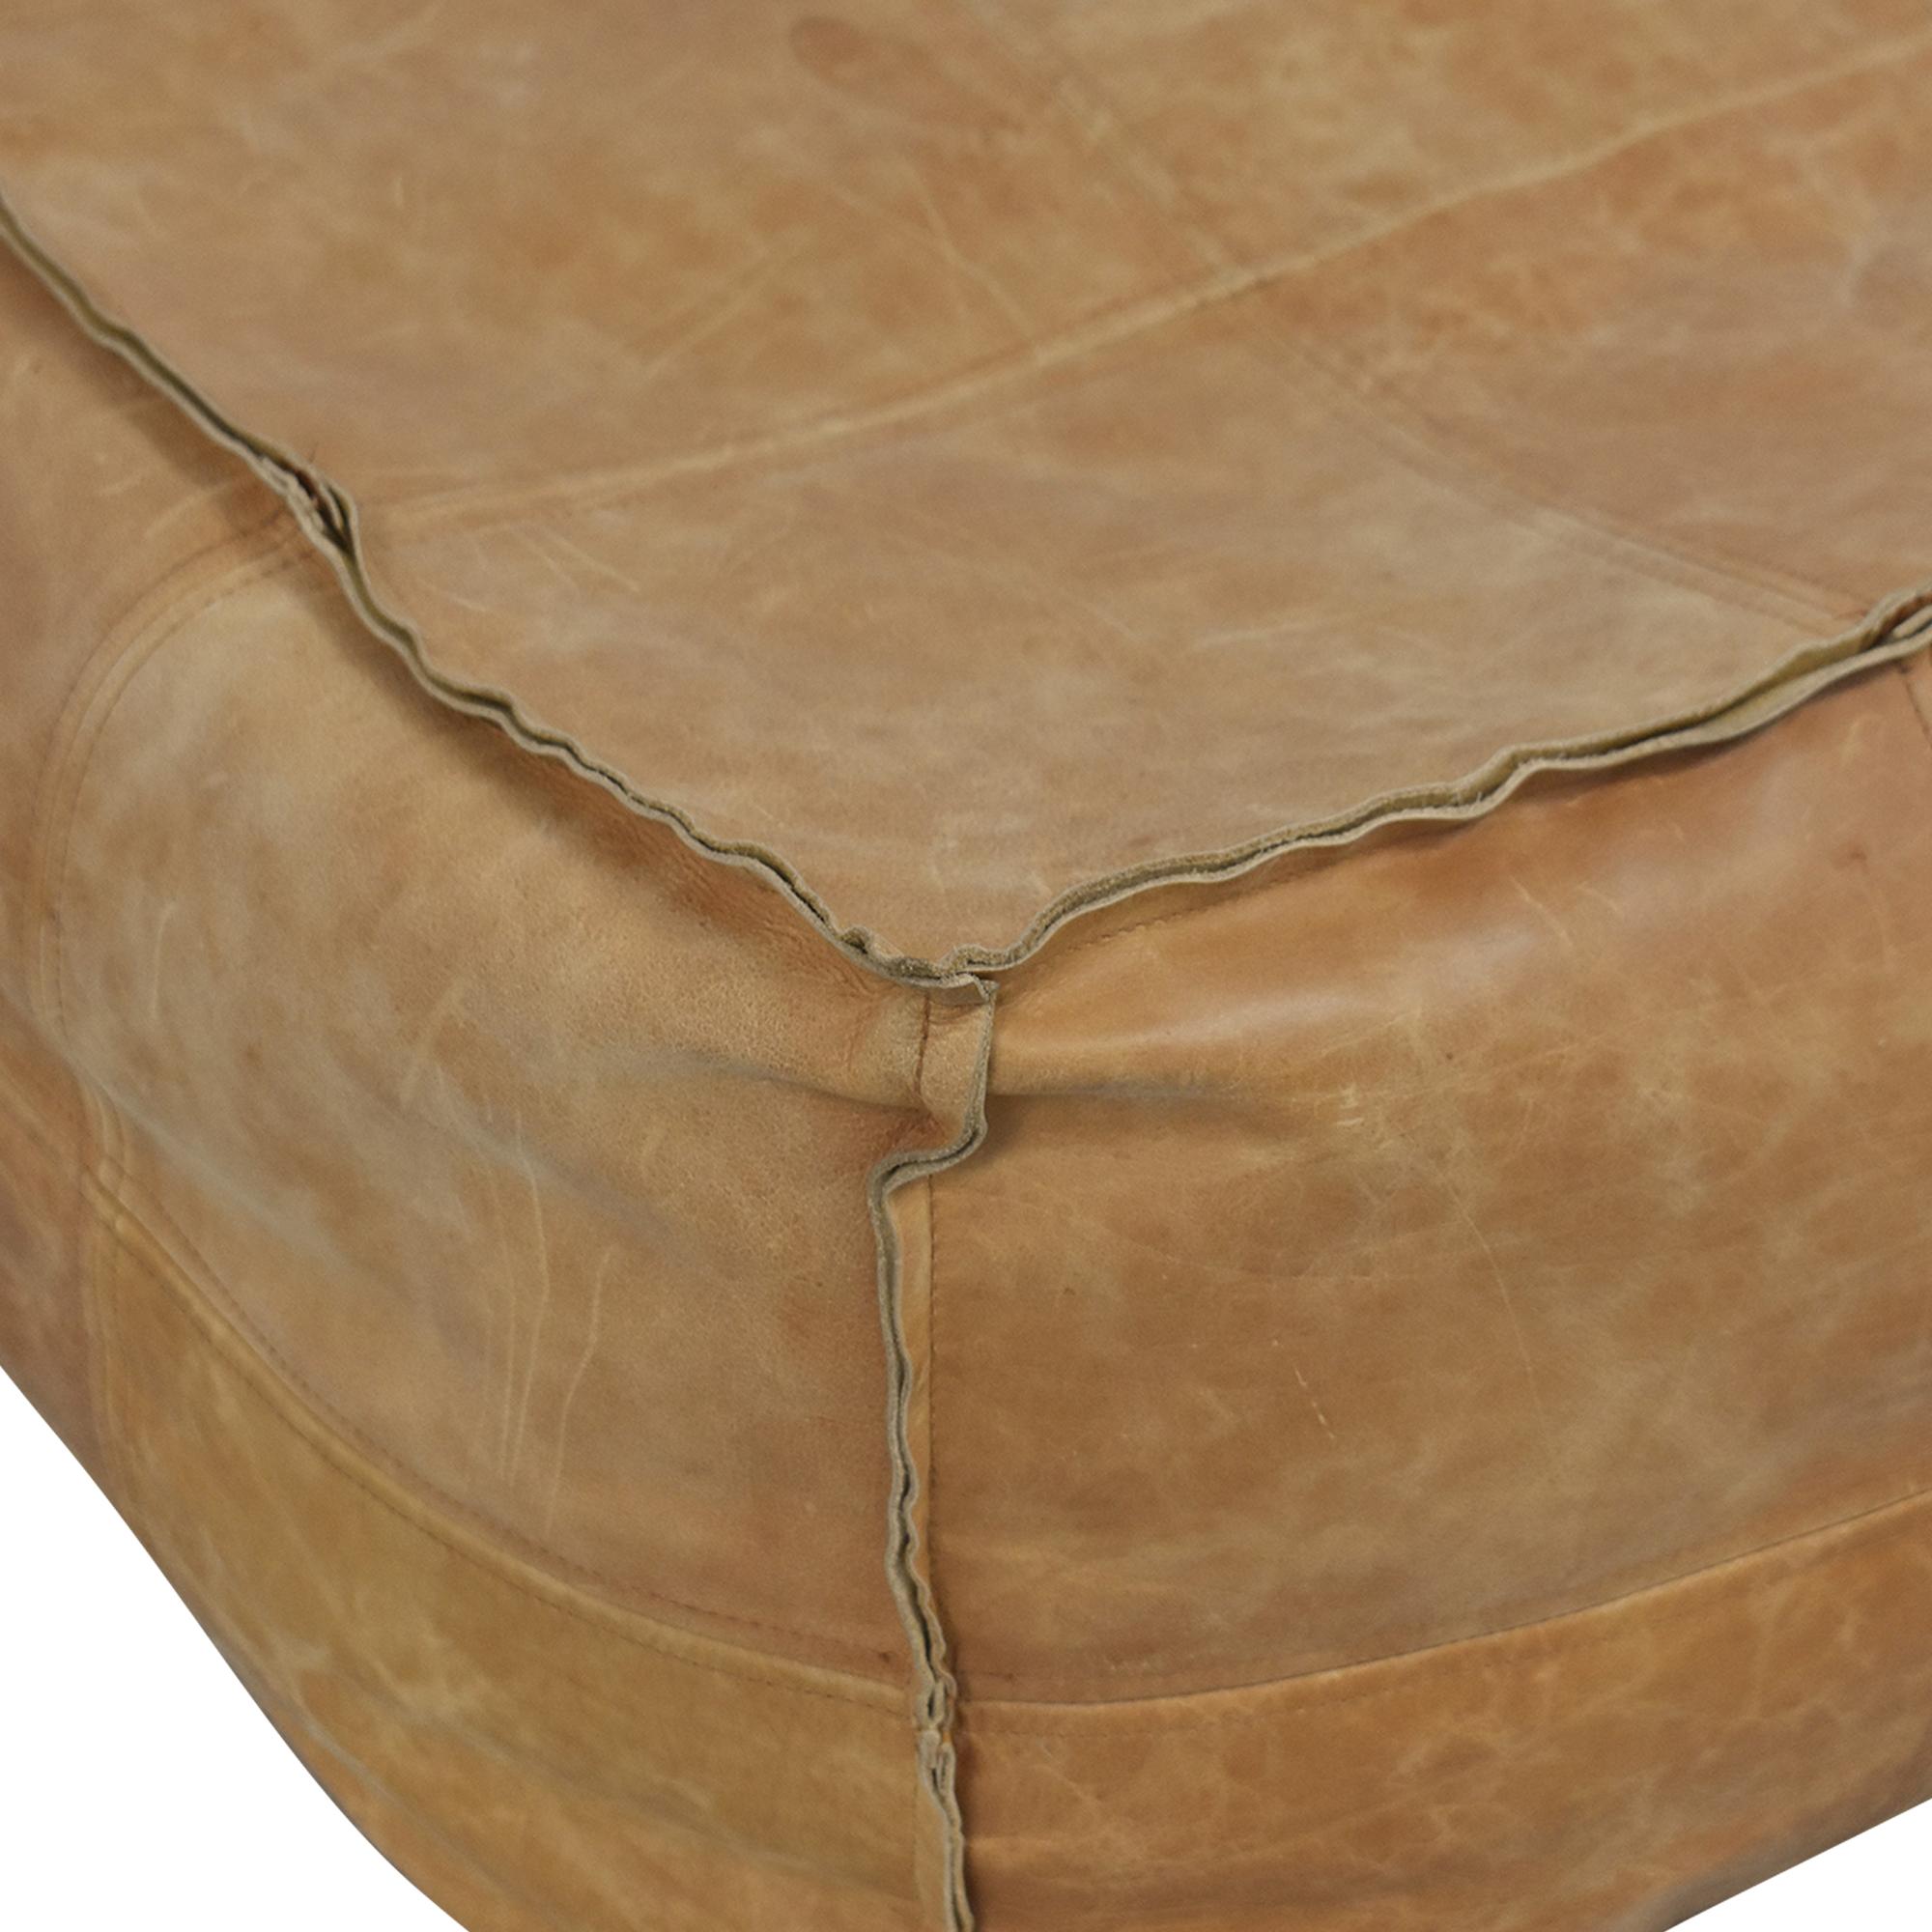 shop CB2 Medium Square Leather Ottoman Pouf CB2 Ottomans